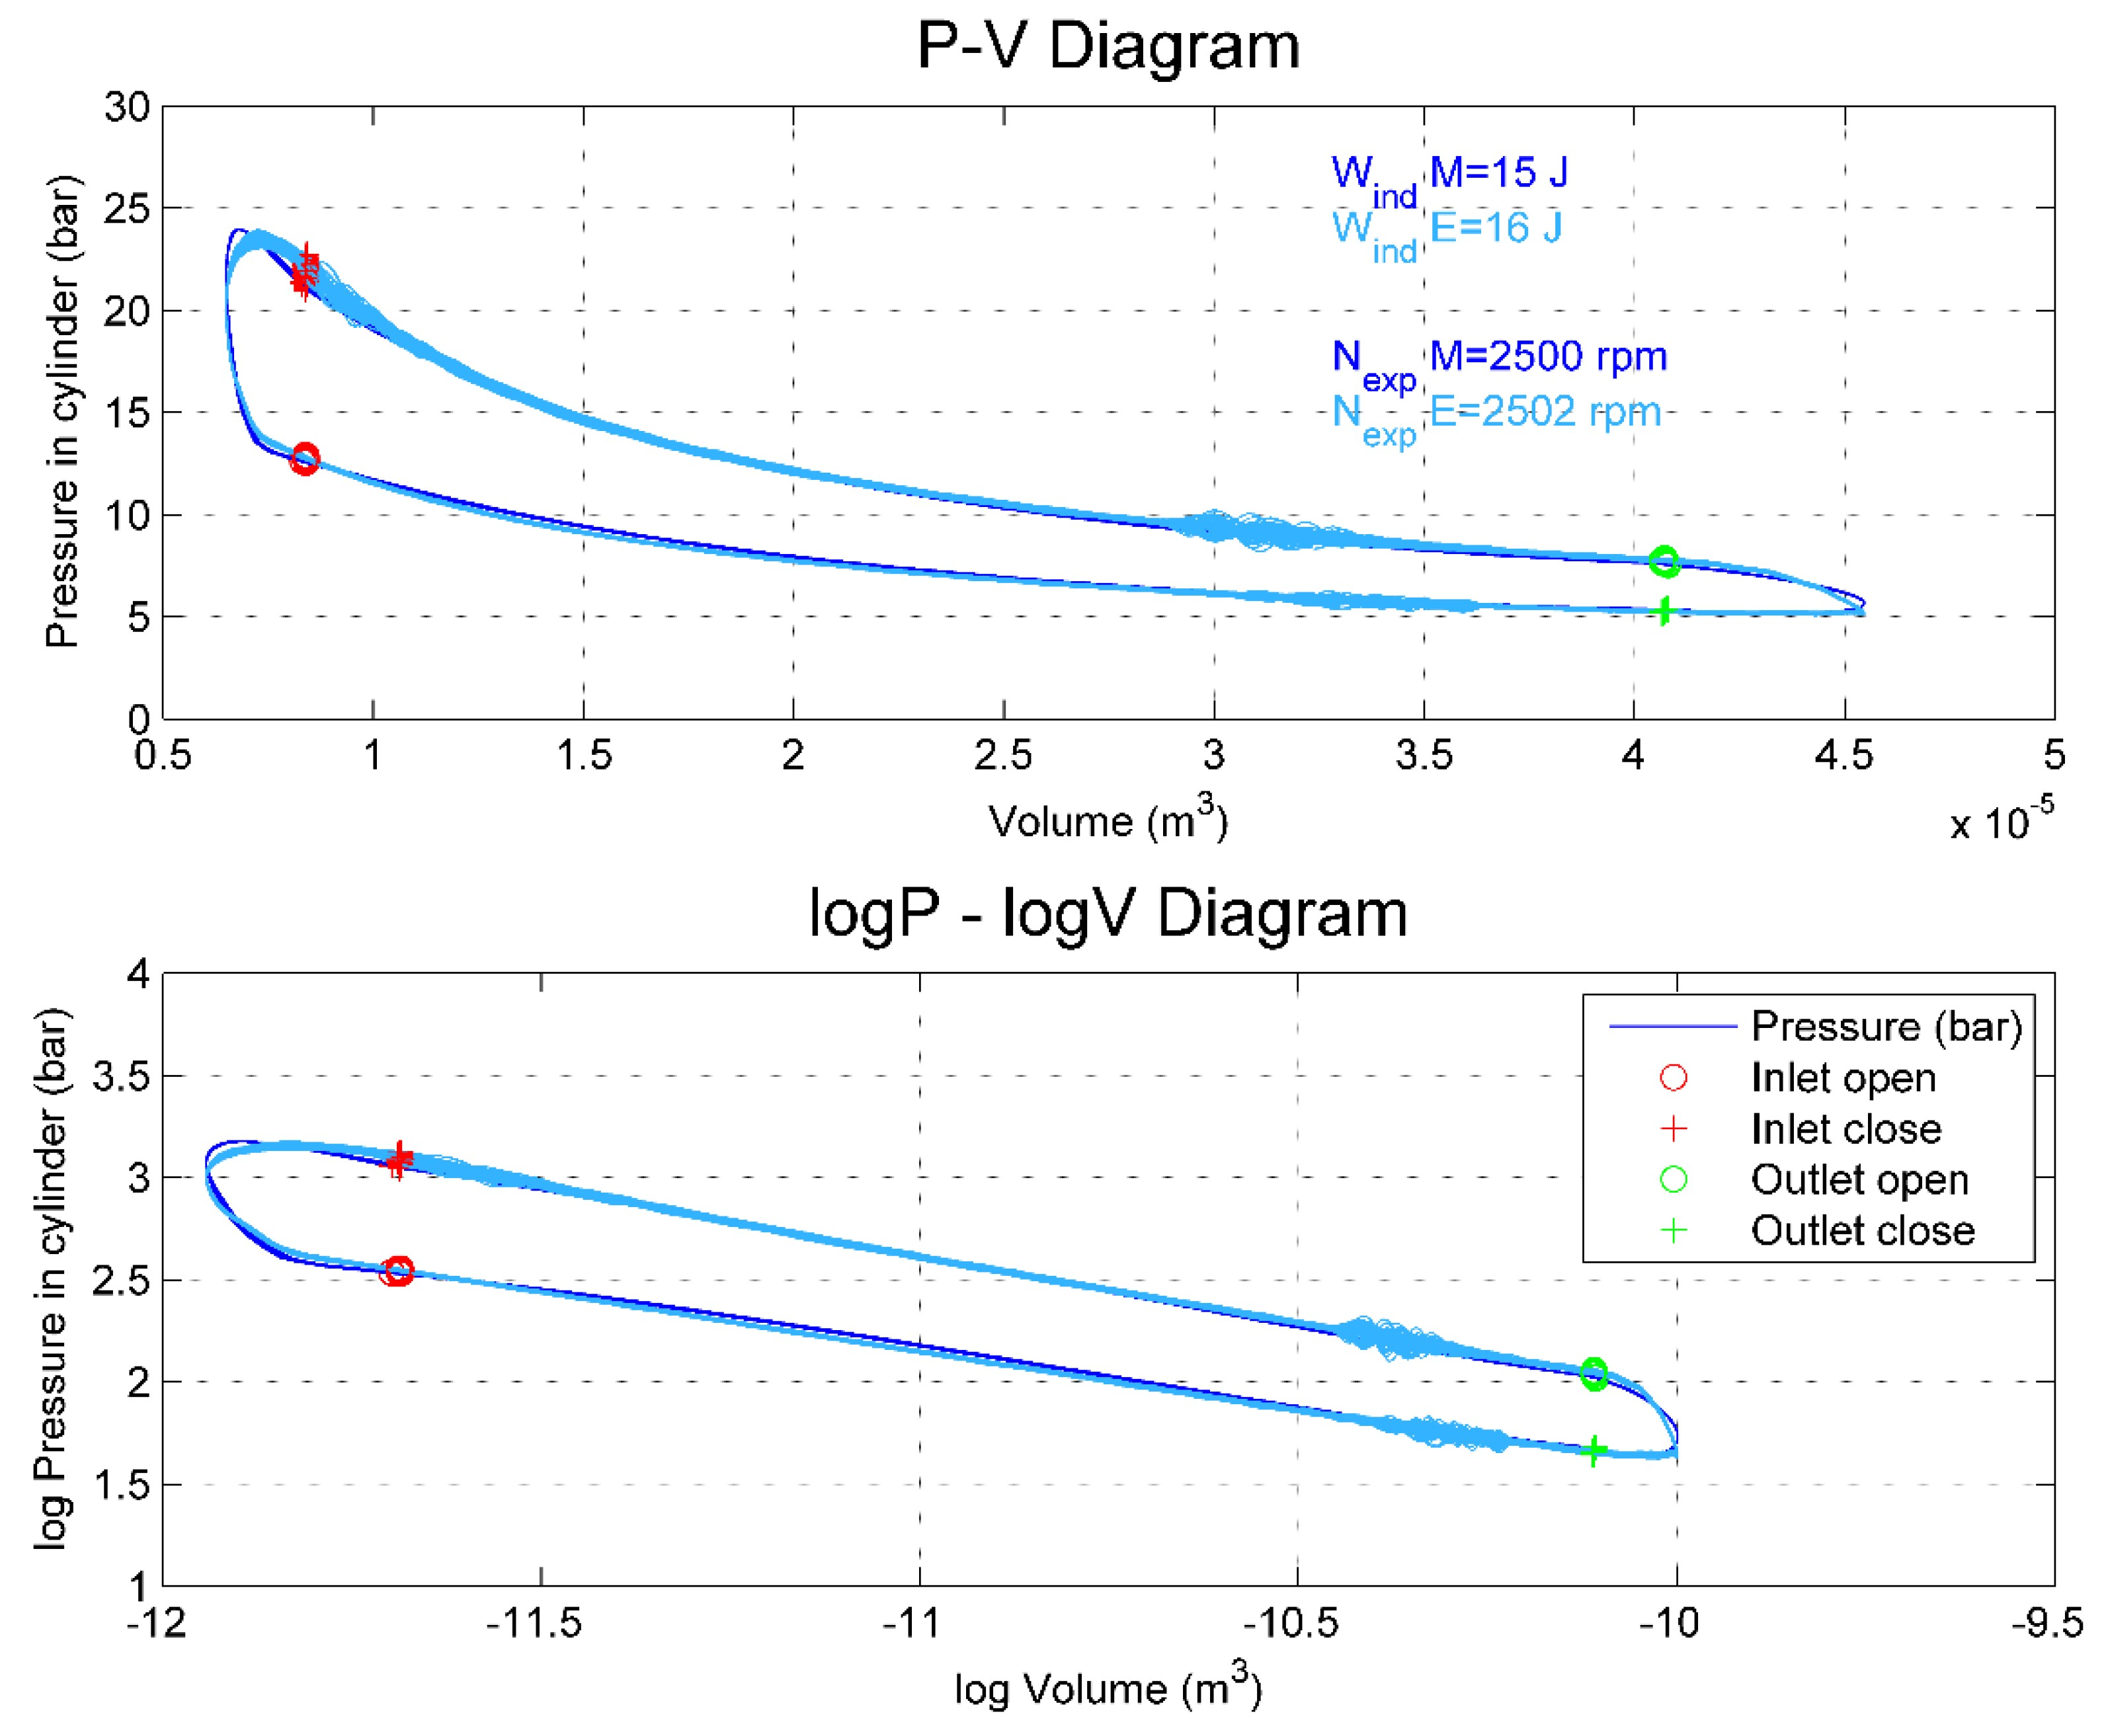 4 Stroke Petrol Engine Pv Diagram Energies Free Full Text Of 4 Stroke Petrol Engine Pv Diagram